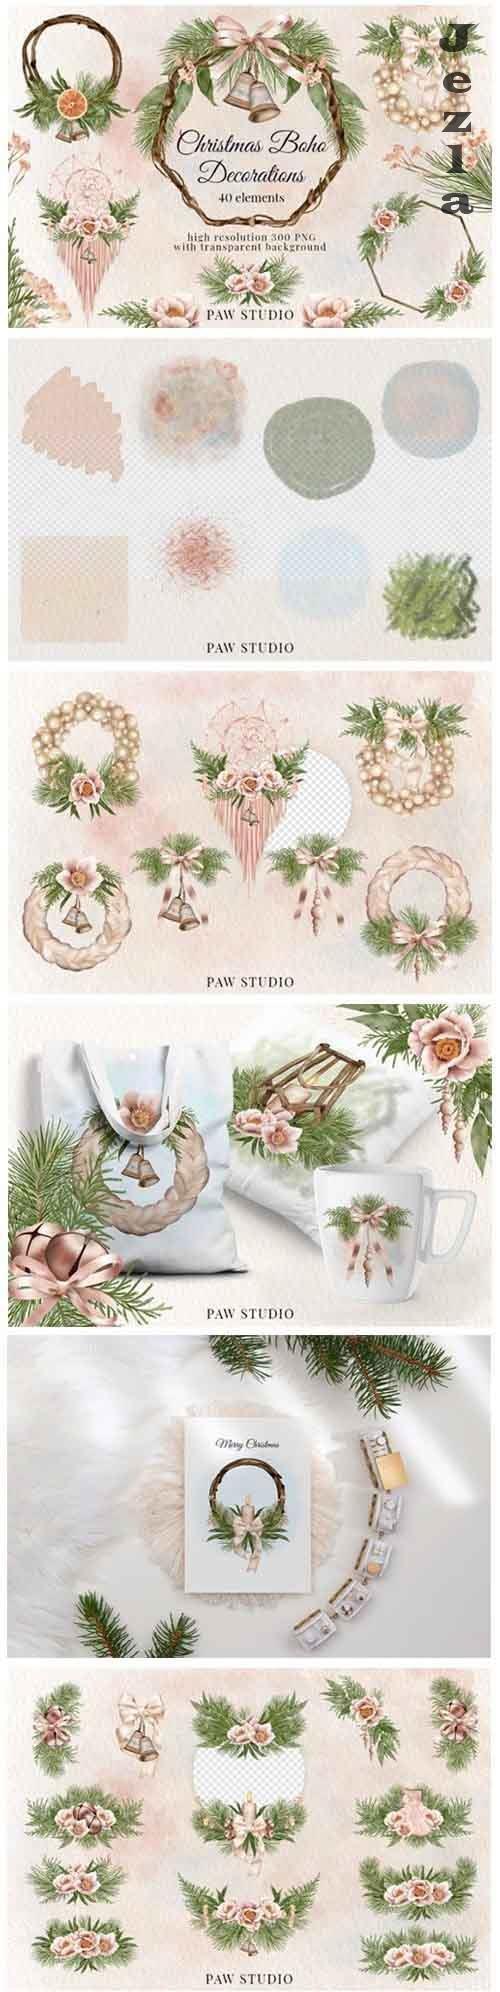 Christmas Boho Border Bouquet Wreath Winter Decorations - 906190